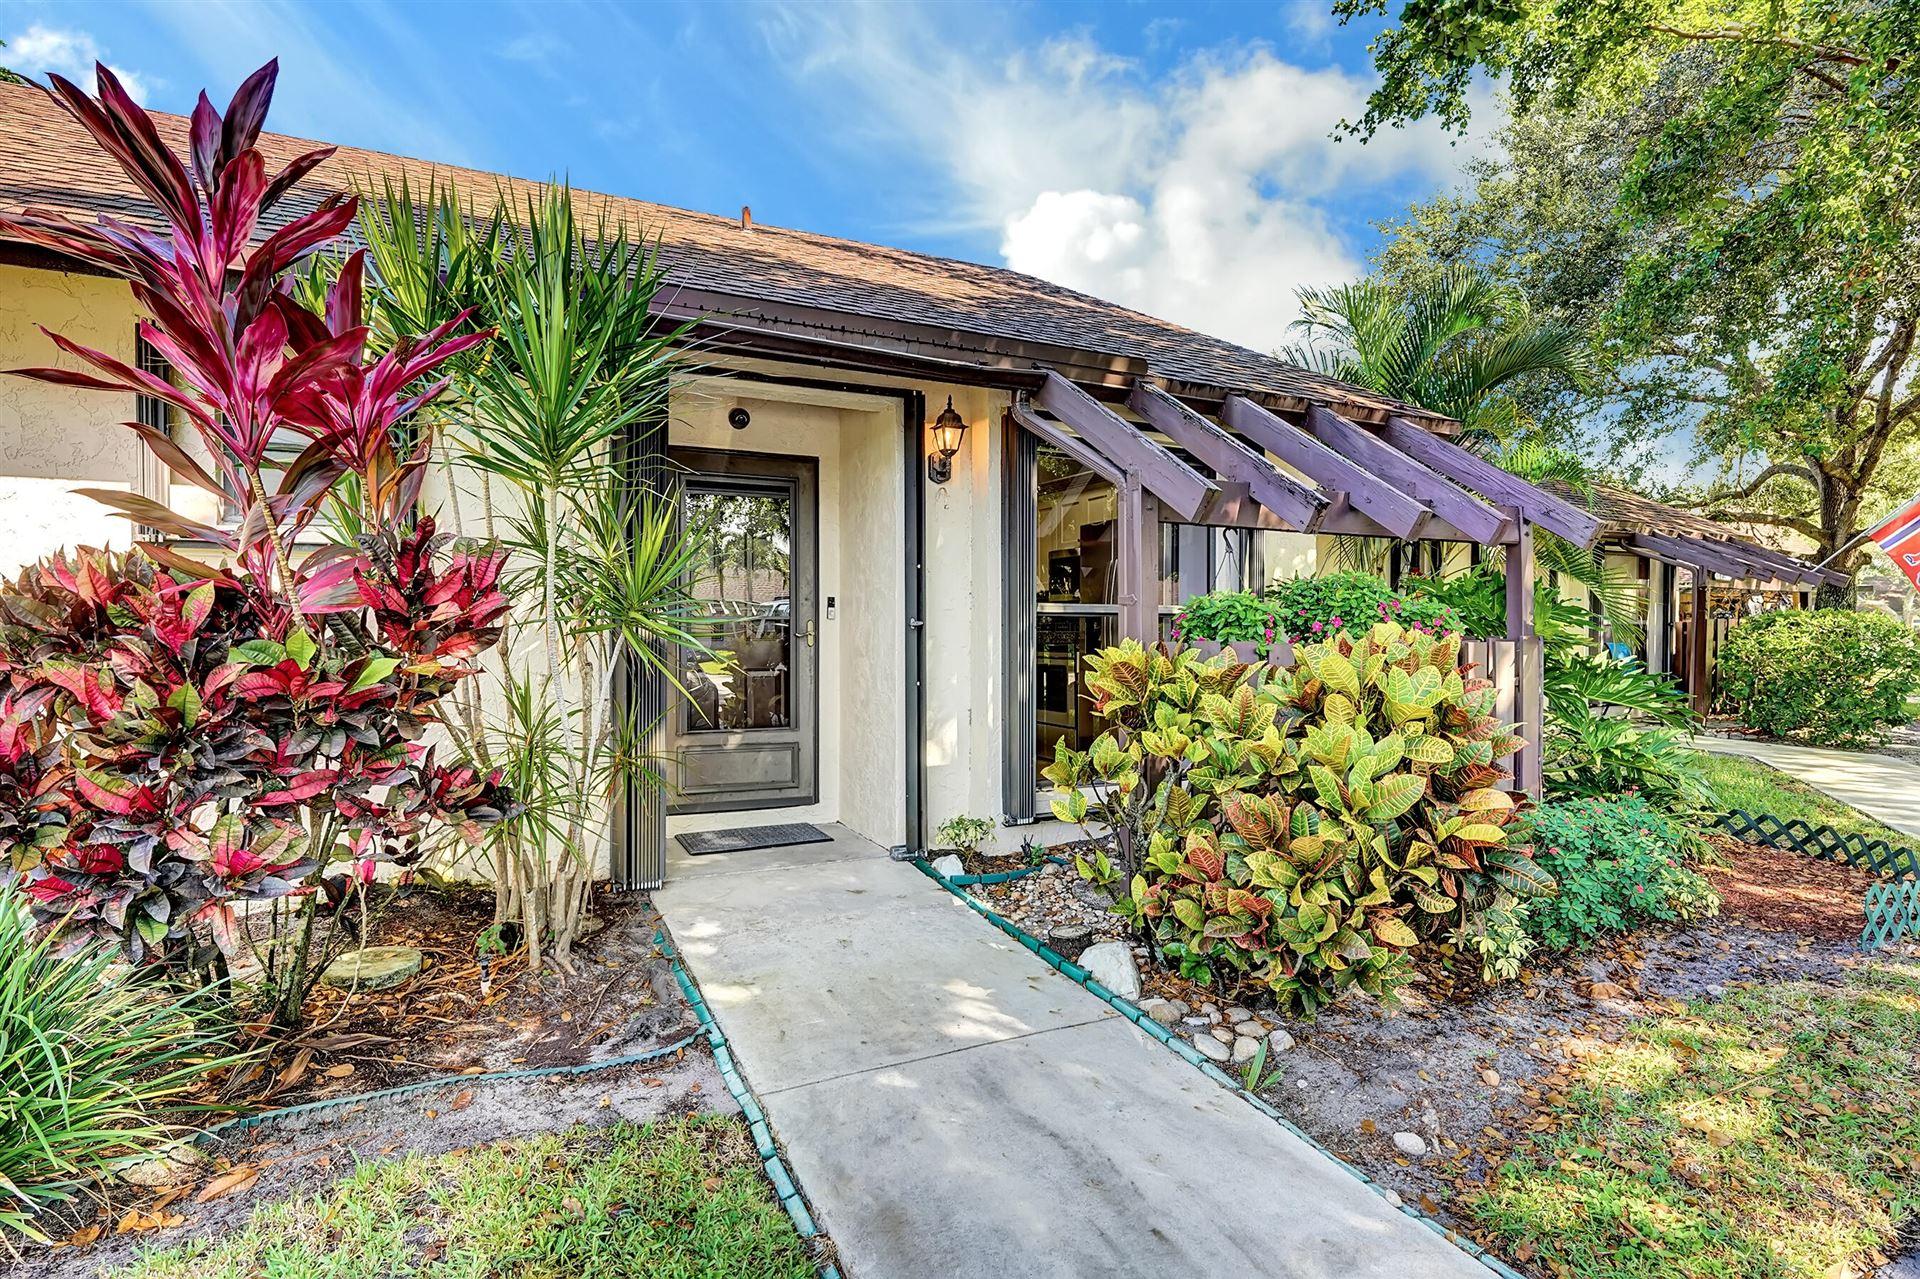 99 Via De Casas Norte, Boynton Beach, FL 33426 - MLS#: RX-10745399